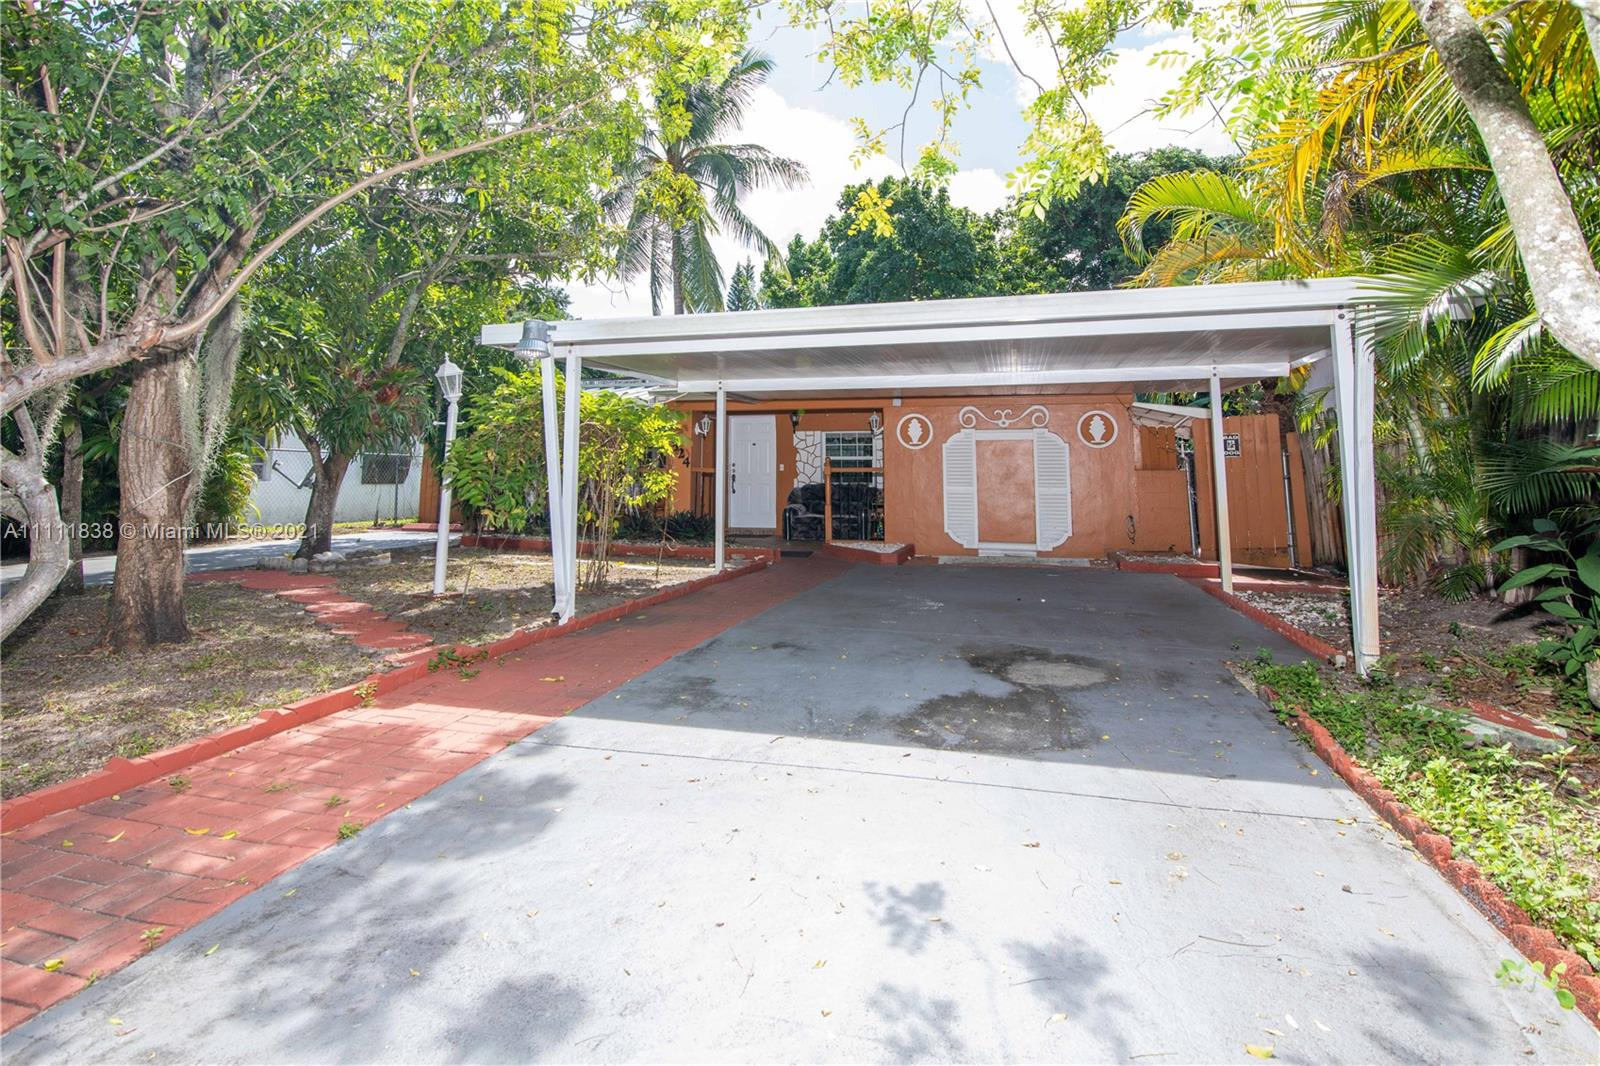 Single Family Home,For Sale,1524 NE 172nd St, North Miami Beach, Florida 33162,Brickell,realty,broker,condos near me